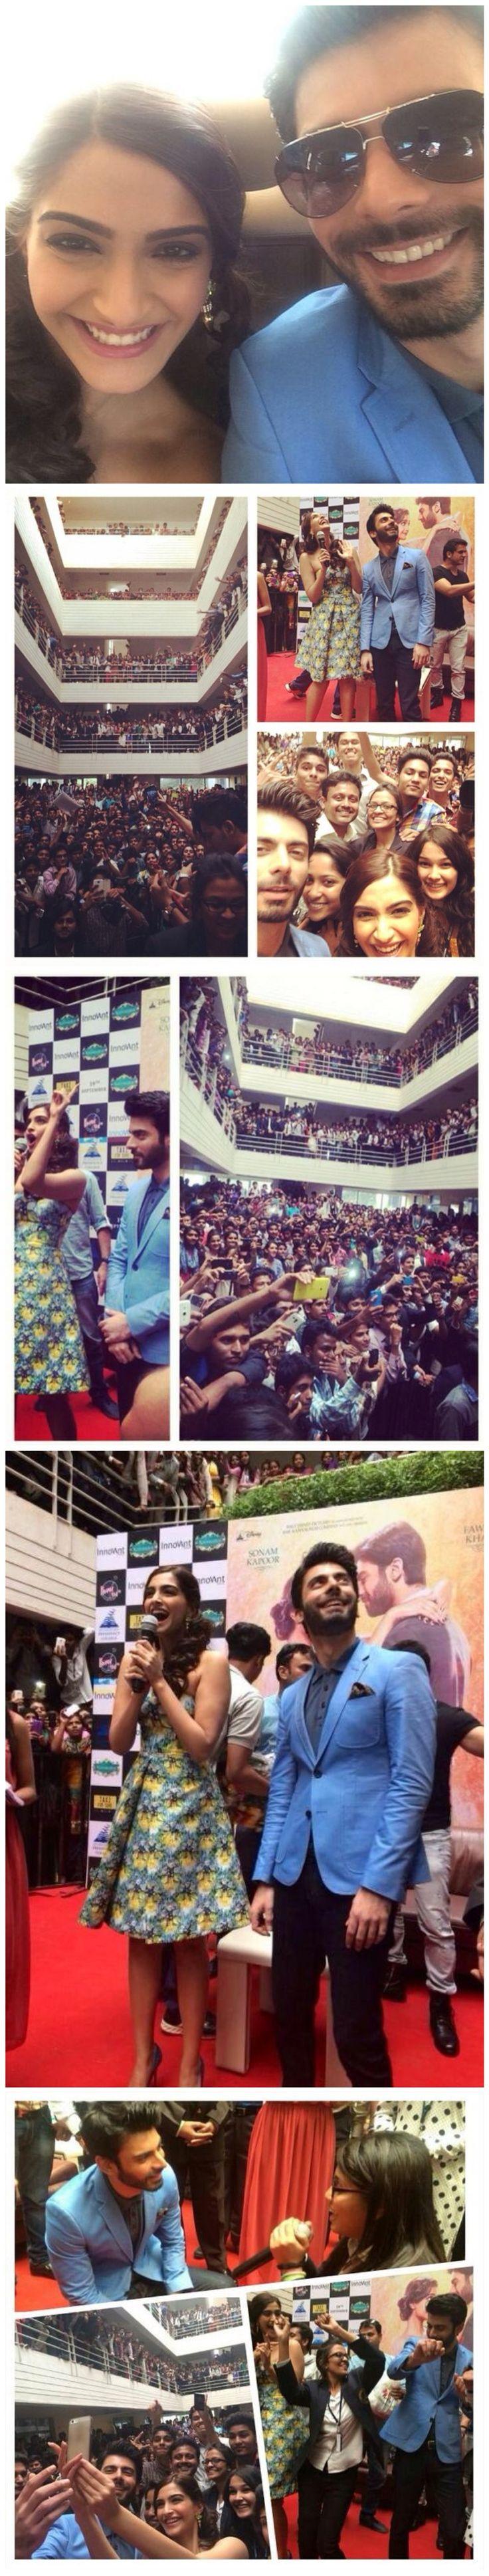 Khoobsurat Diaries: Sonam Kapoor & Fawad Khan create frenzy in Bangalore.